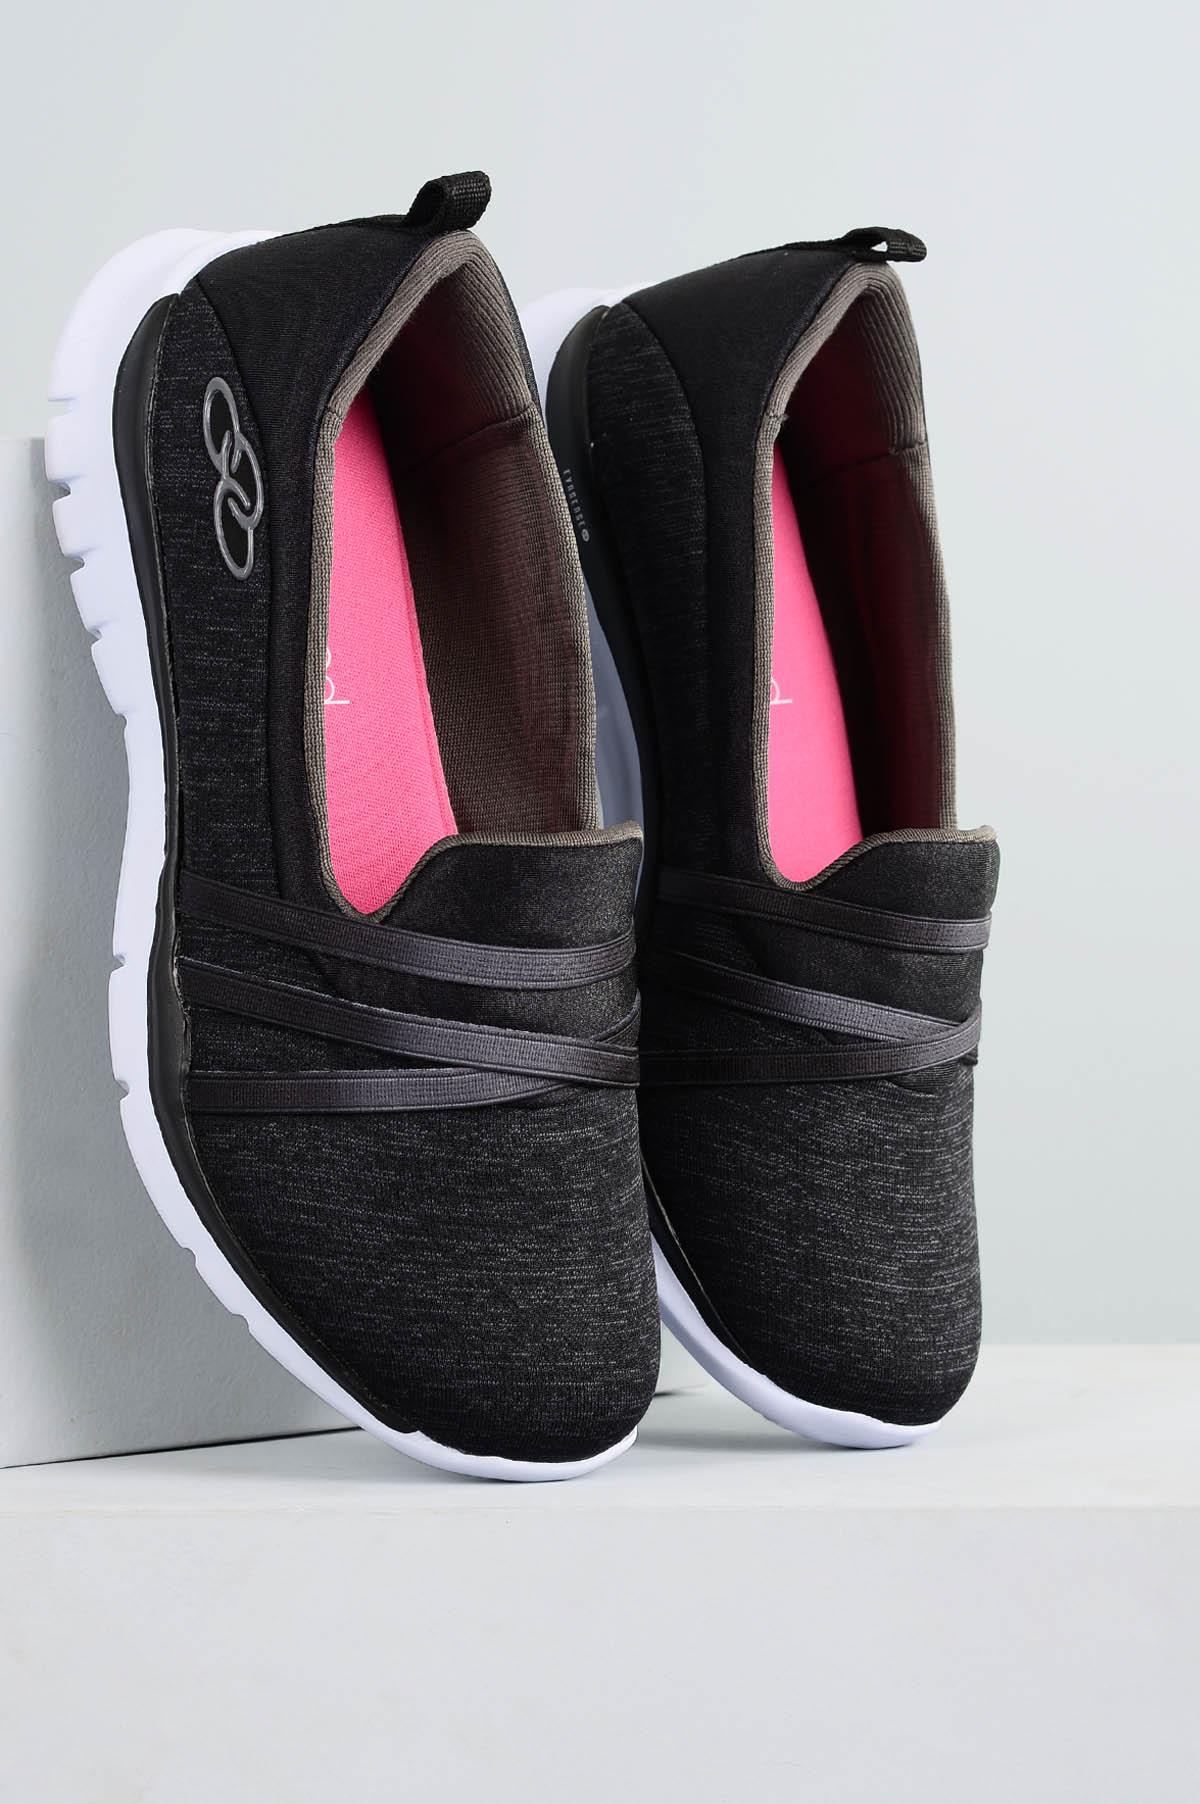 0f3423285c3 Tênis Feminino Olympikus Angel Stripe TEC - PRETO - Mundial Calçados